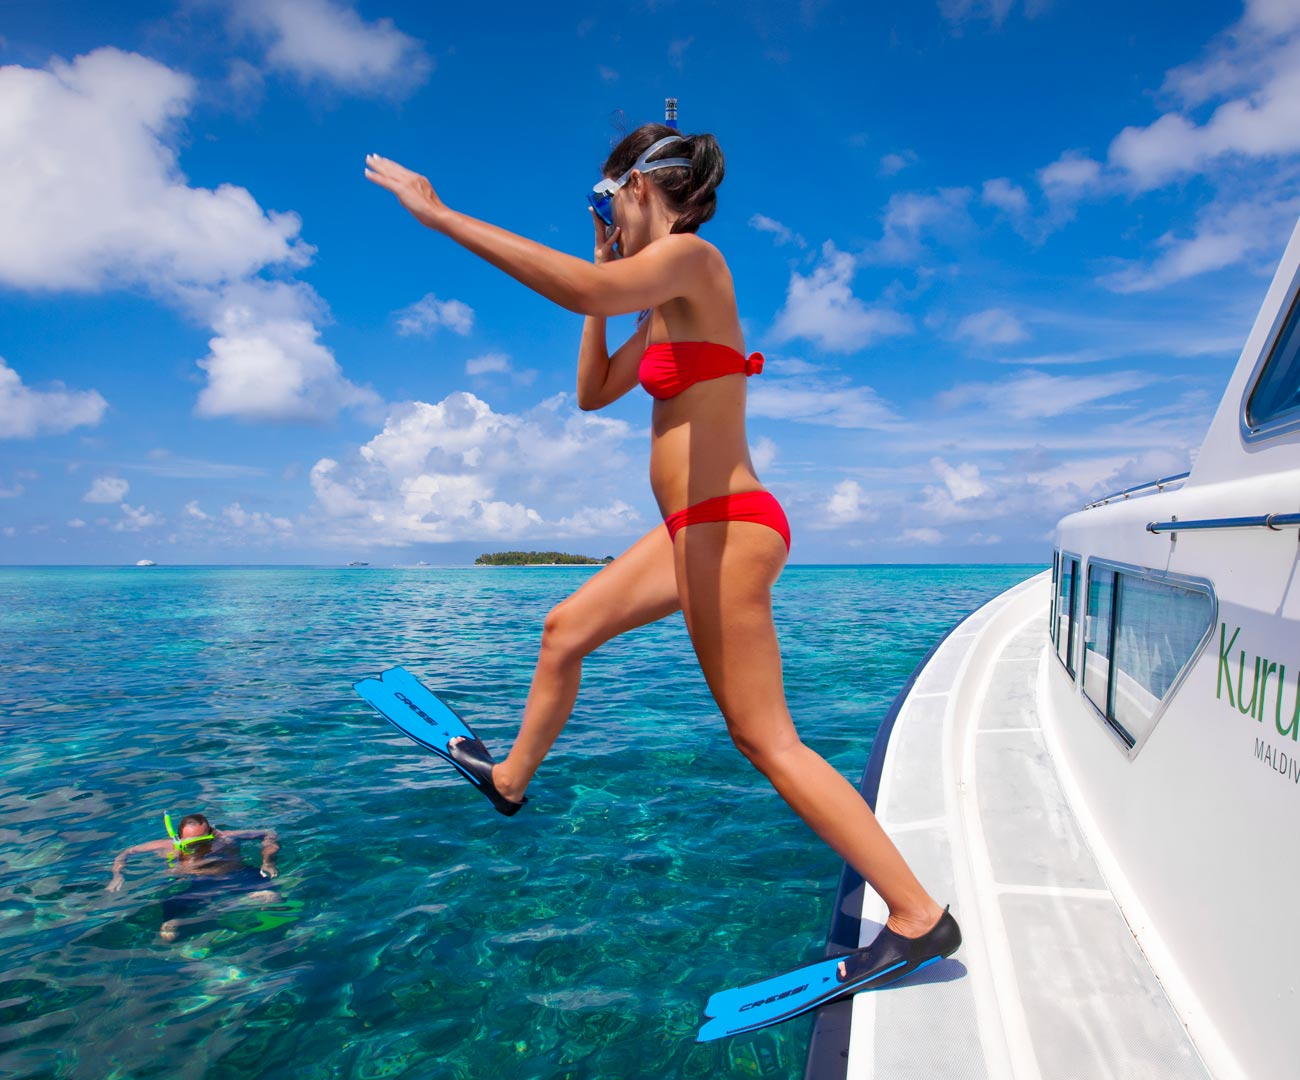 Snorkelling in the Maldives Islands image| Kurumba Maldives Resort